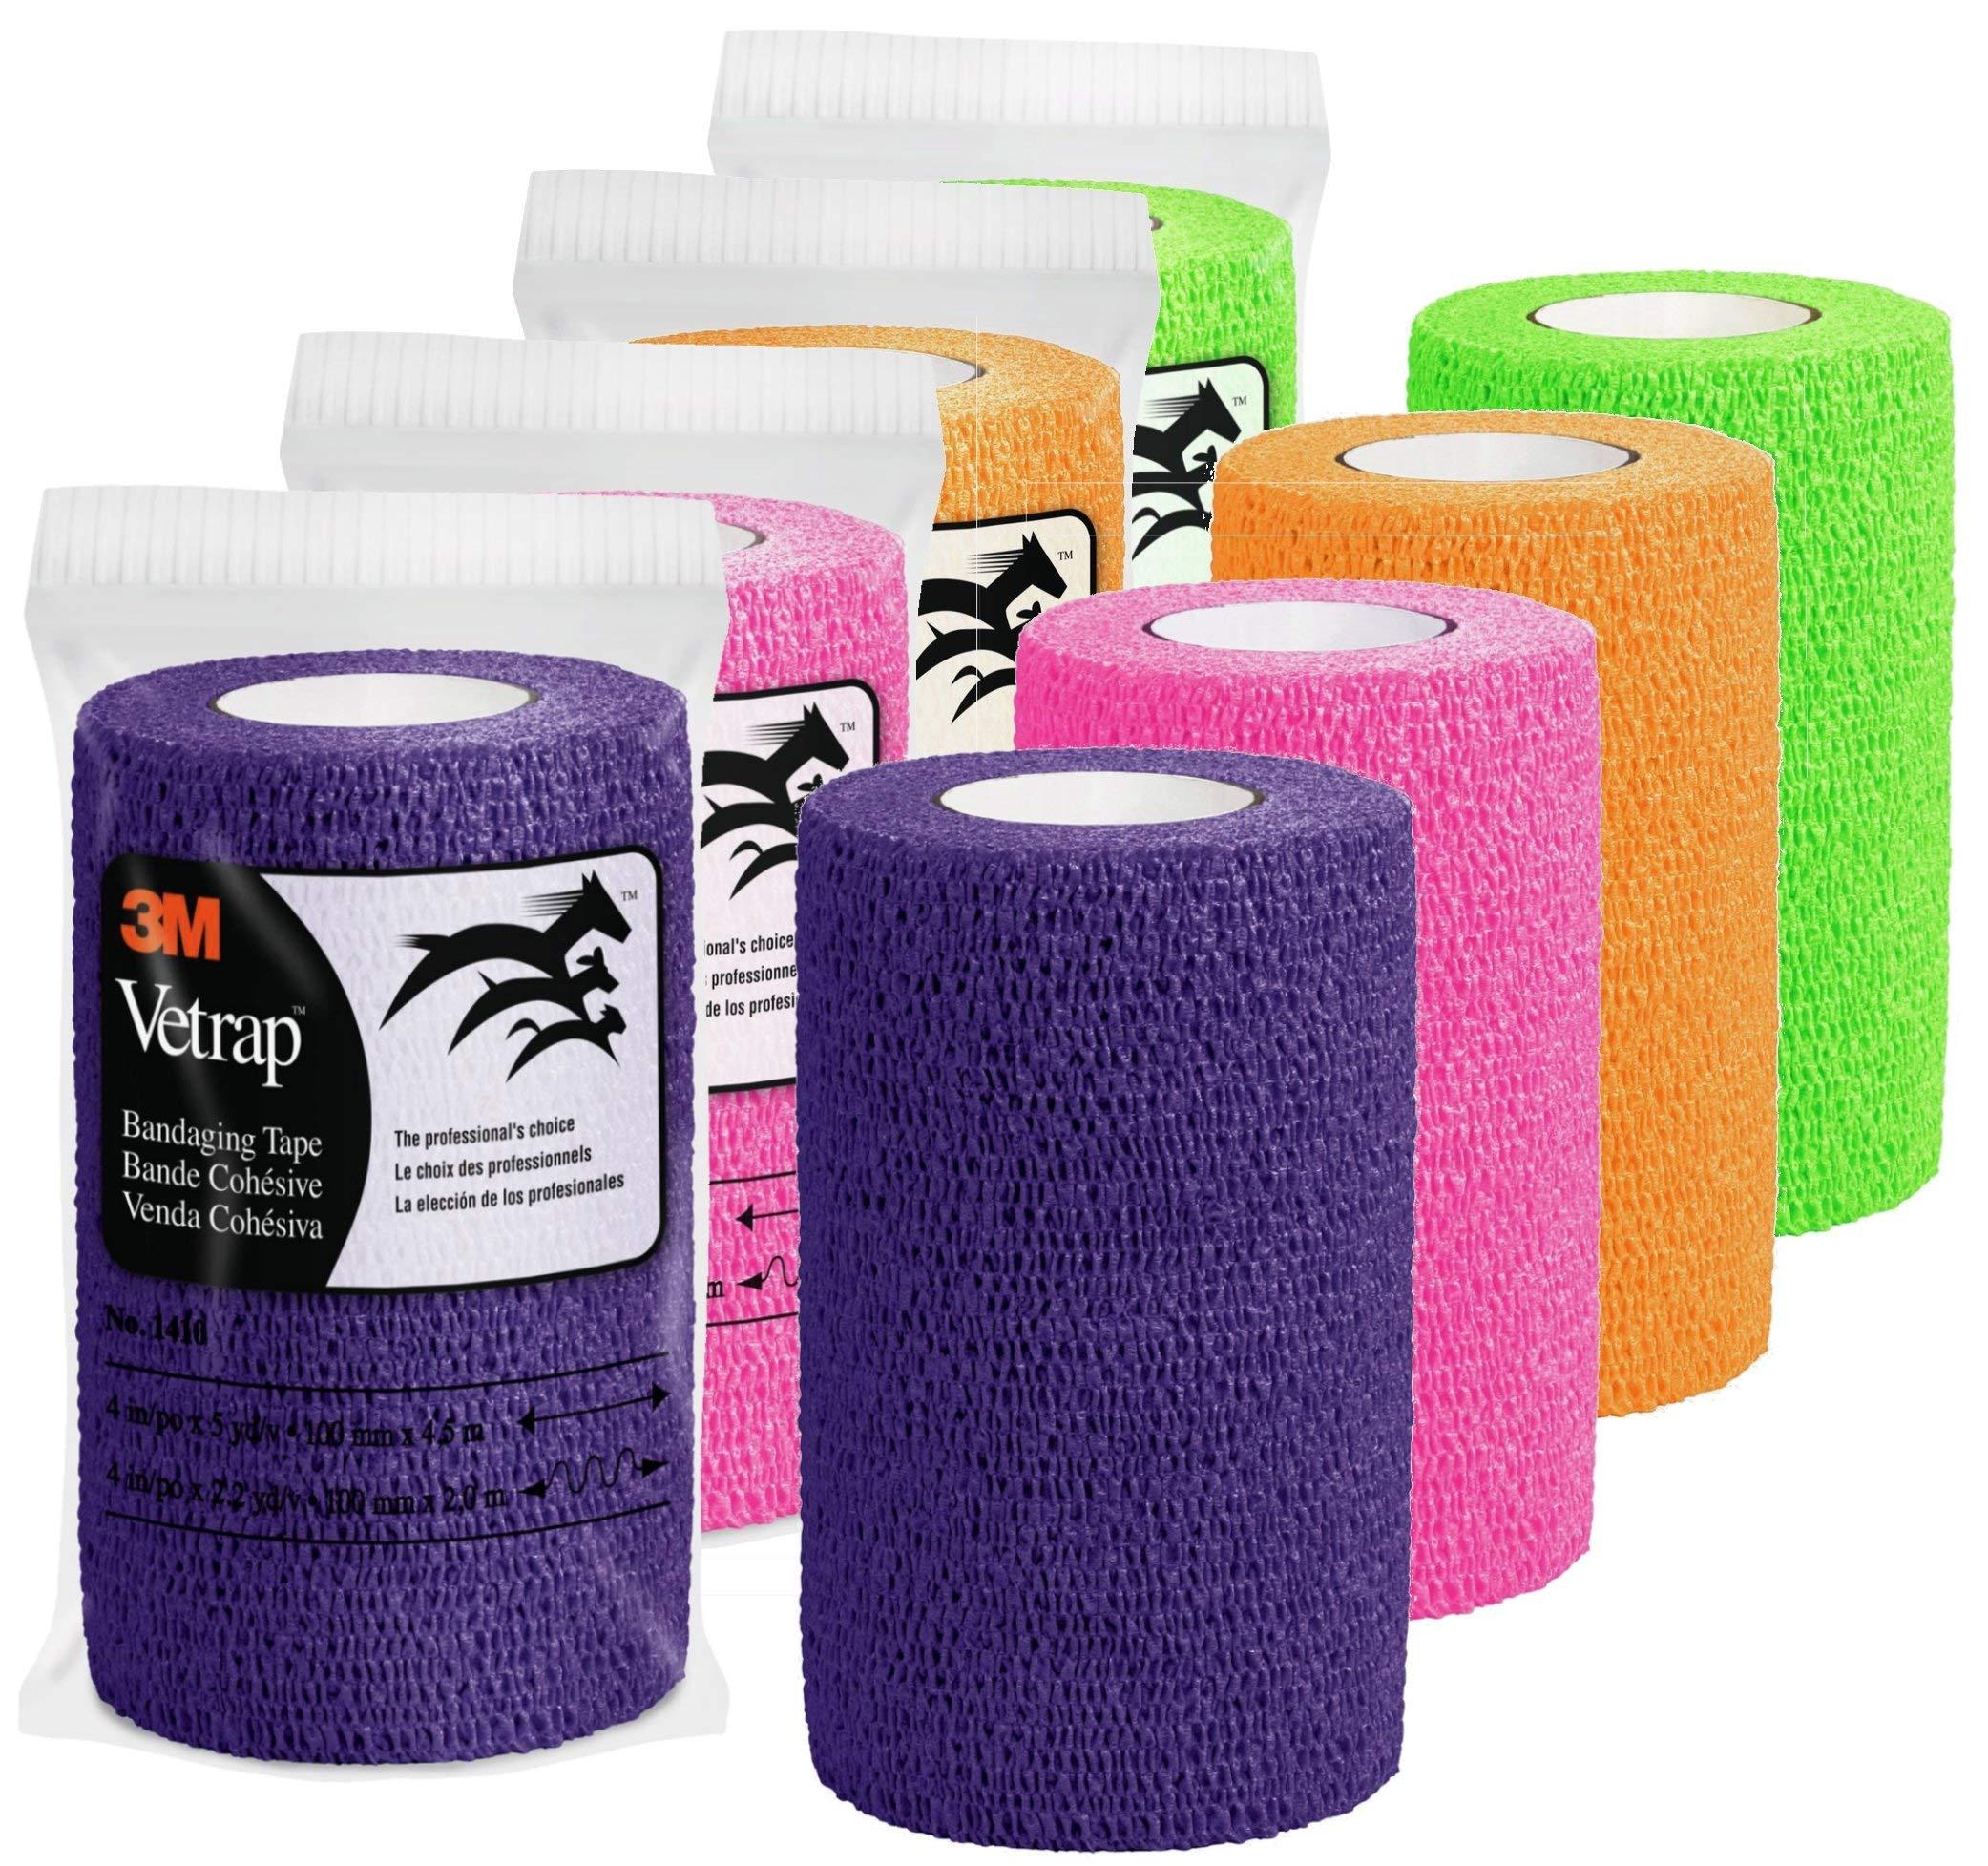 3M Vetrap 4'' Bright Color Bandaging Tape, 4''x 5 Yards, 3M Box, 12 Roll Case (Bright Color Combo) by 3M Vetrap